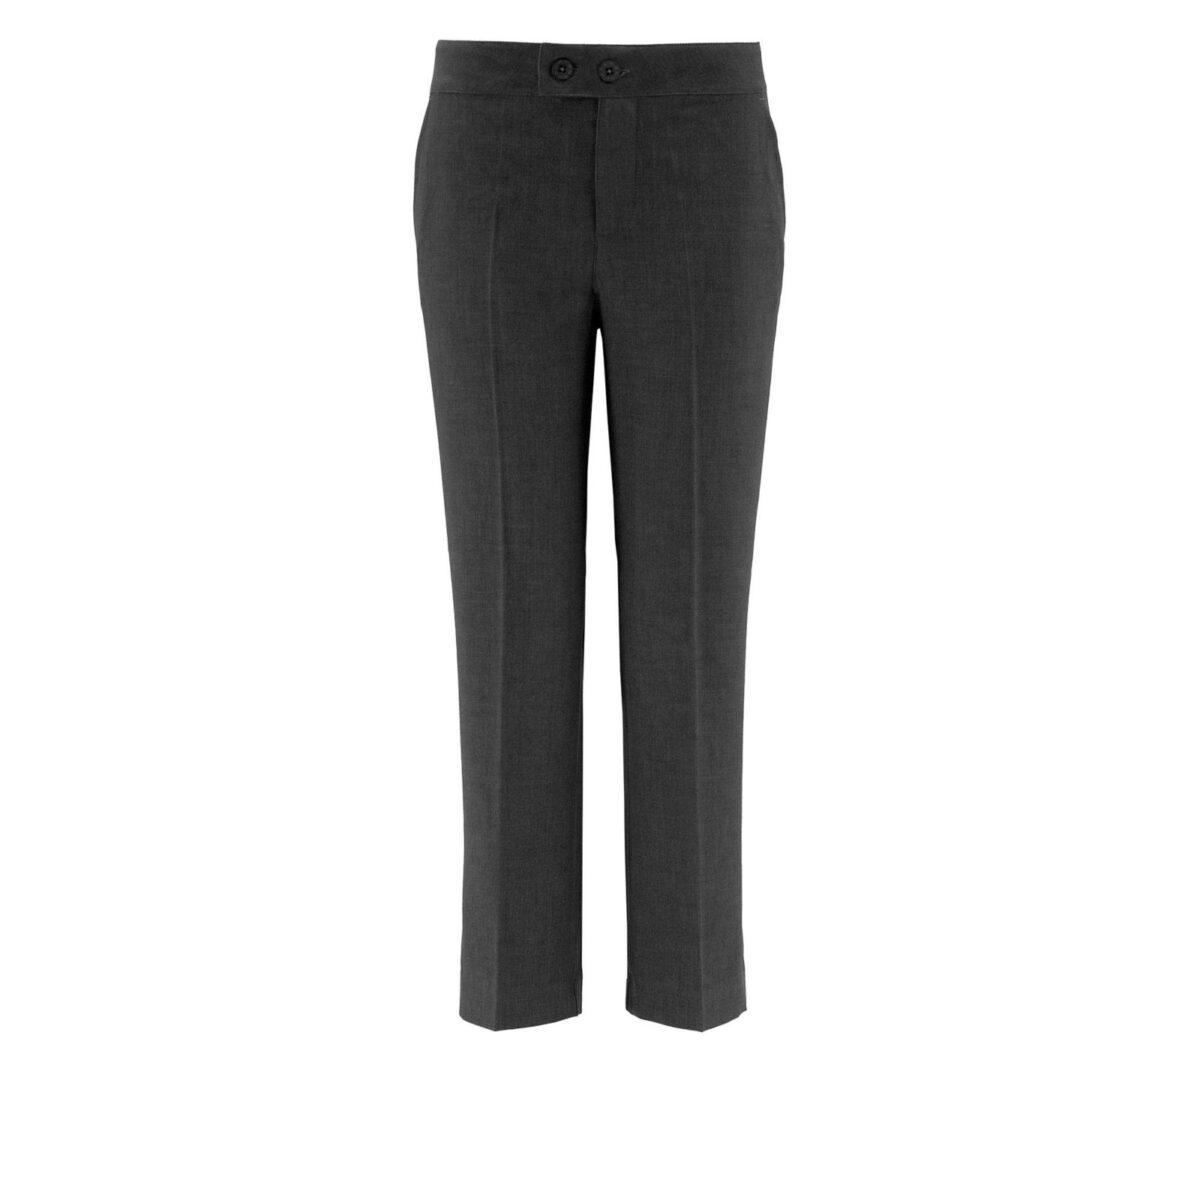 Pantalone Classic melange GRIGIO - vista frontale | Nicla